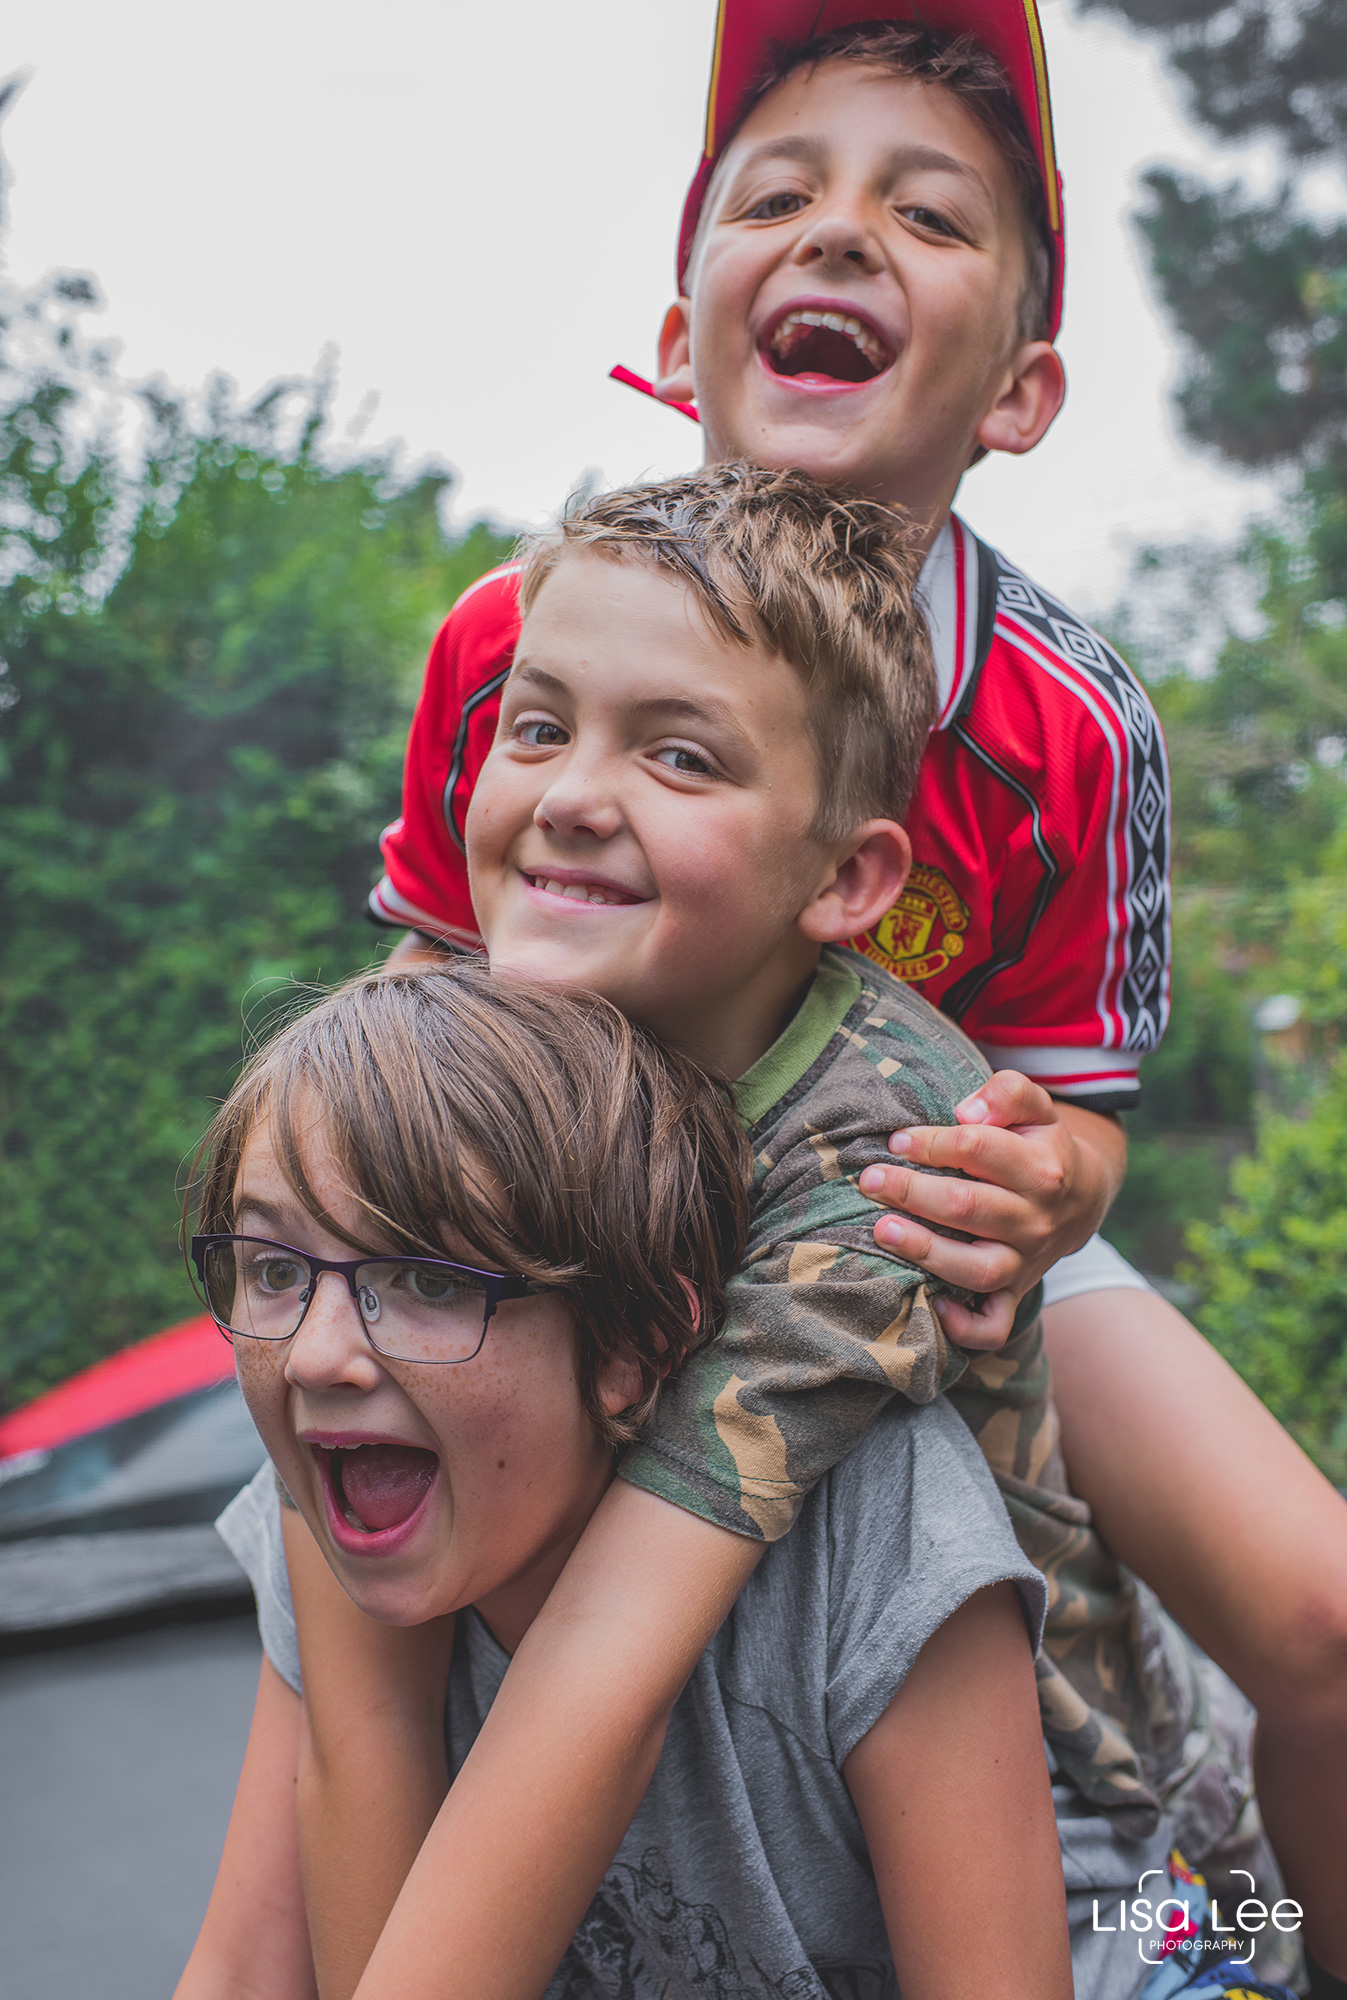 lisa-lee-photography-pateman-family-shoot-4.jpg